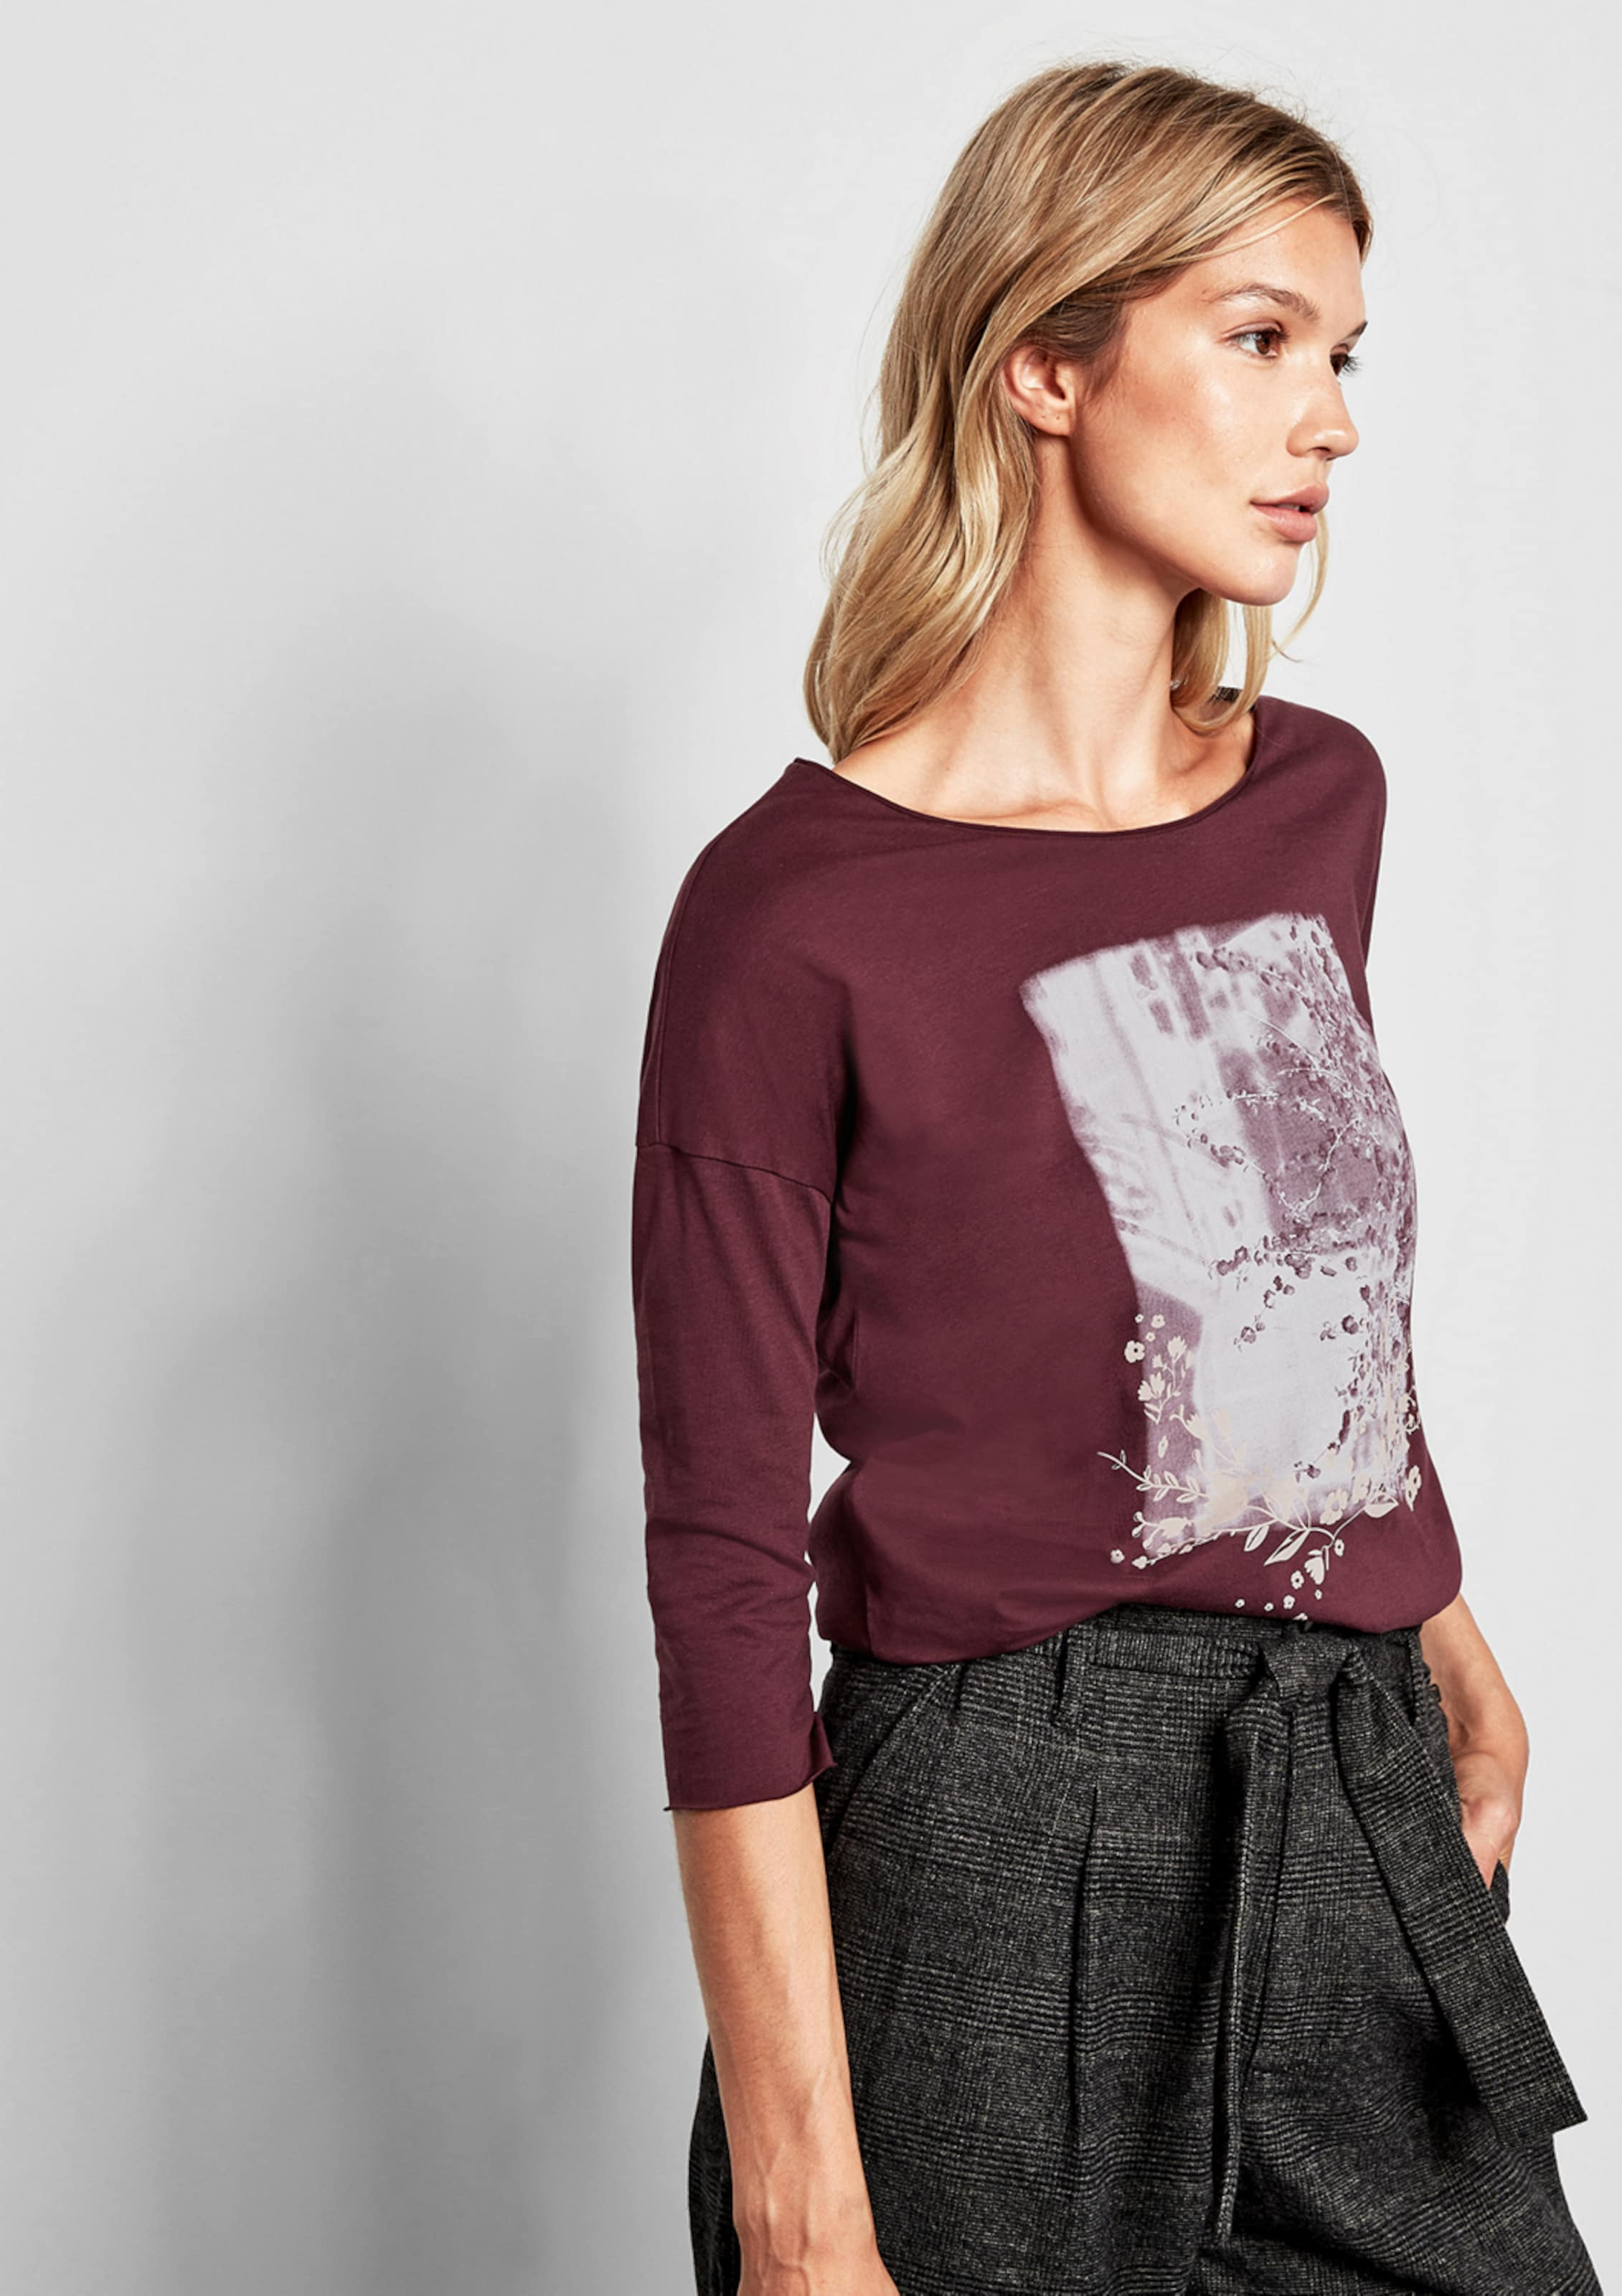 s Shirt In By Q WeinrotWeiß Designed Pn0wkO